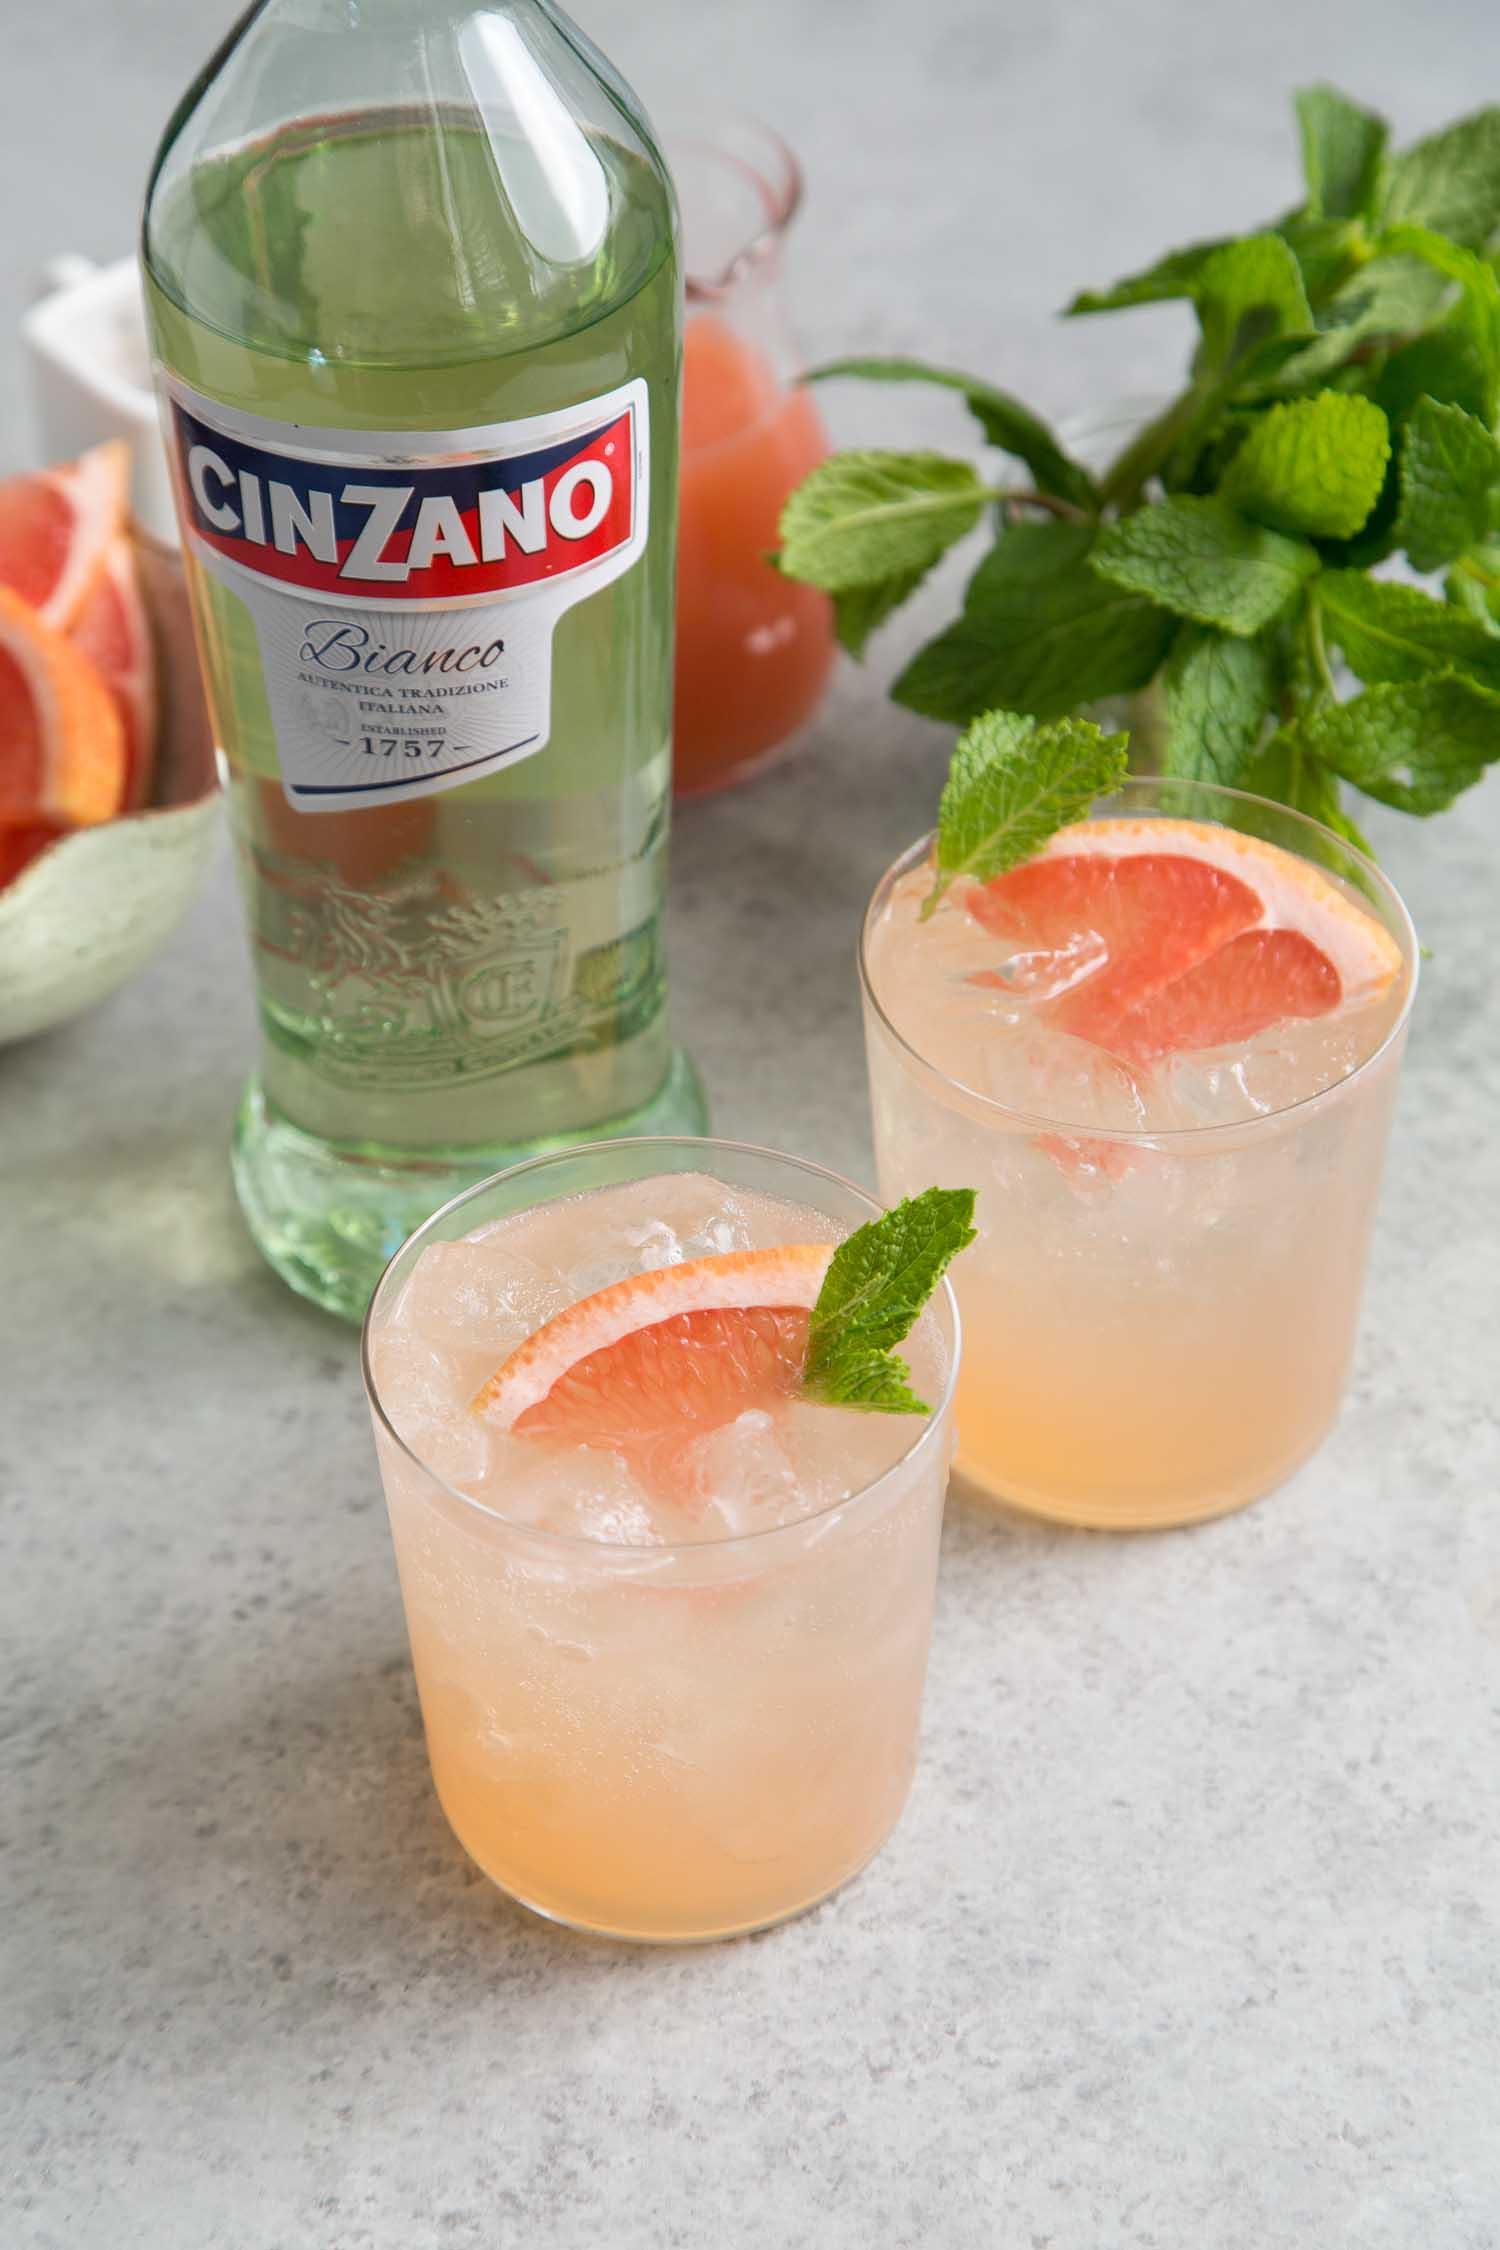 Grapefruit Cinzano